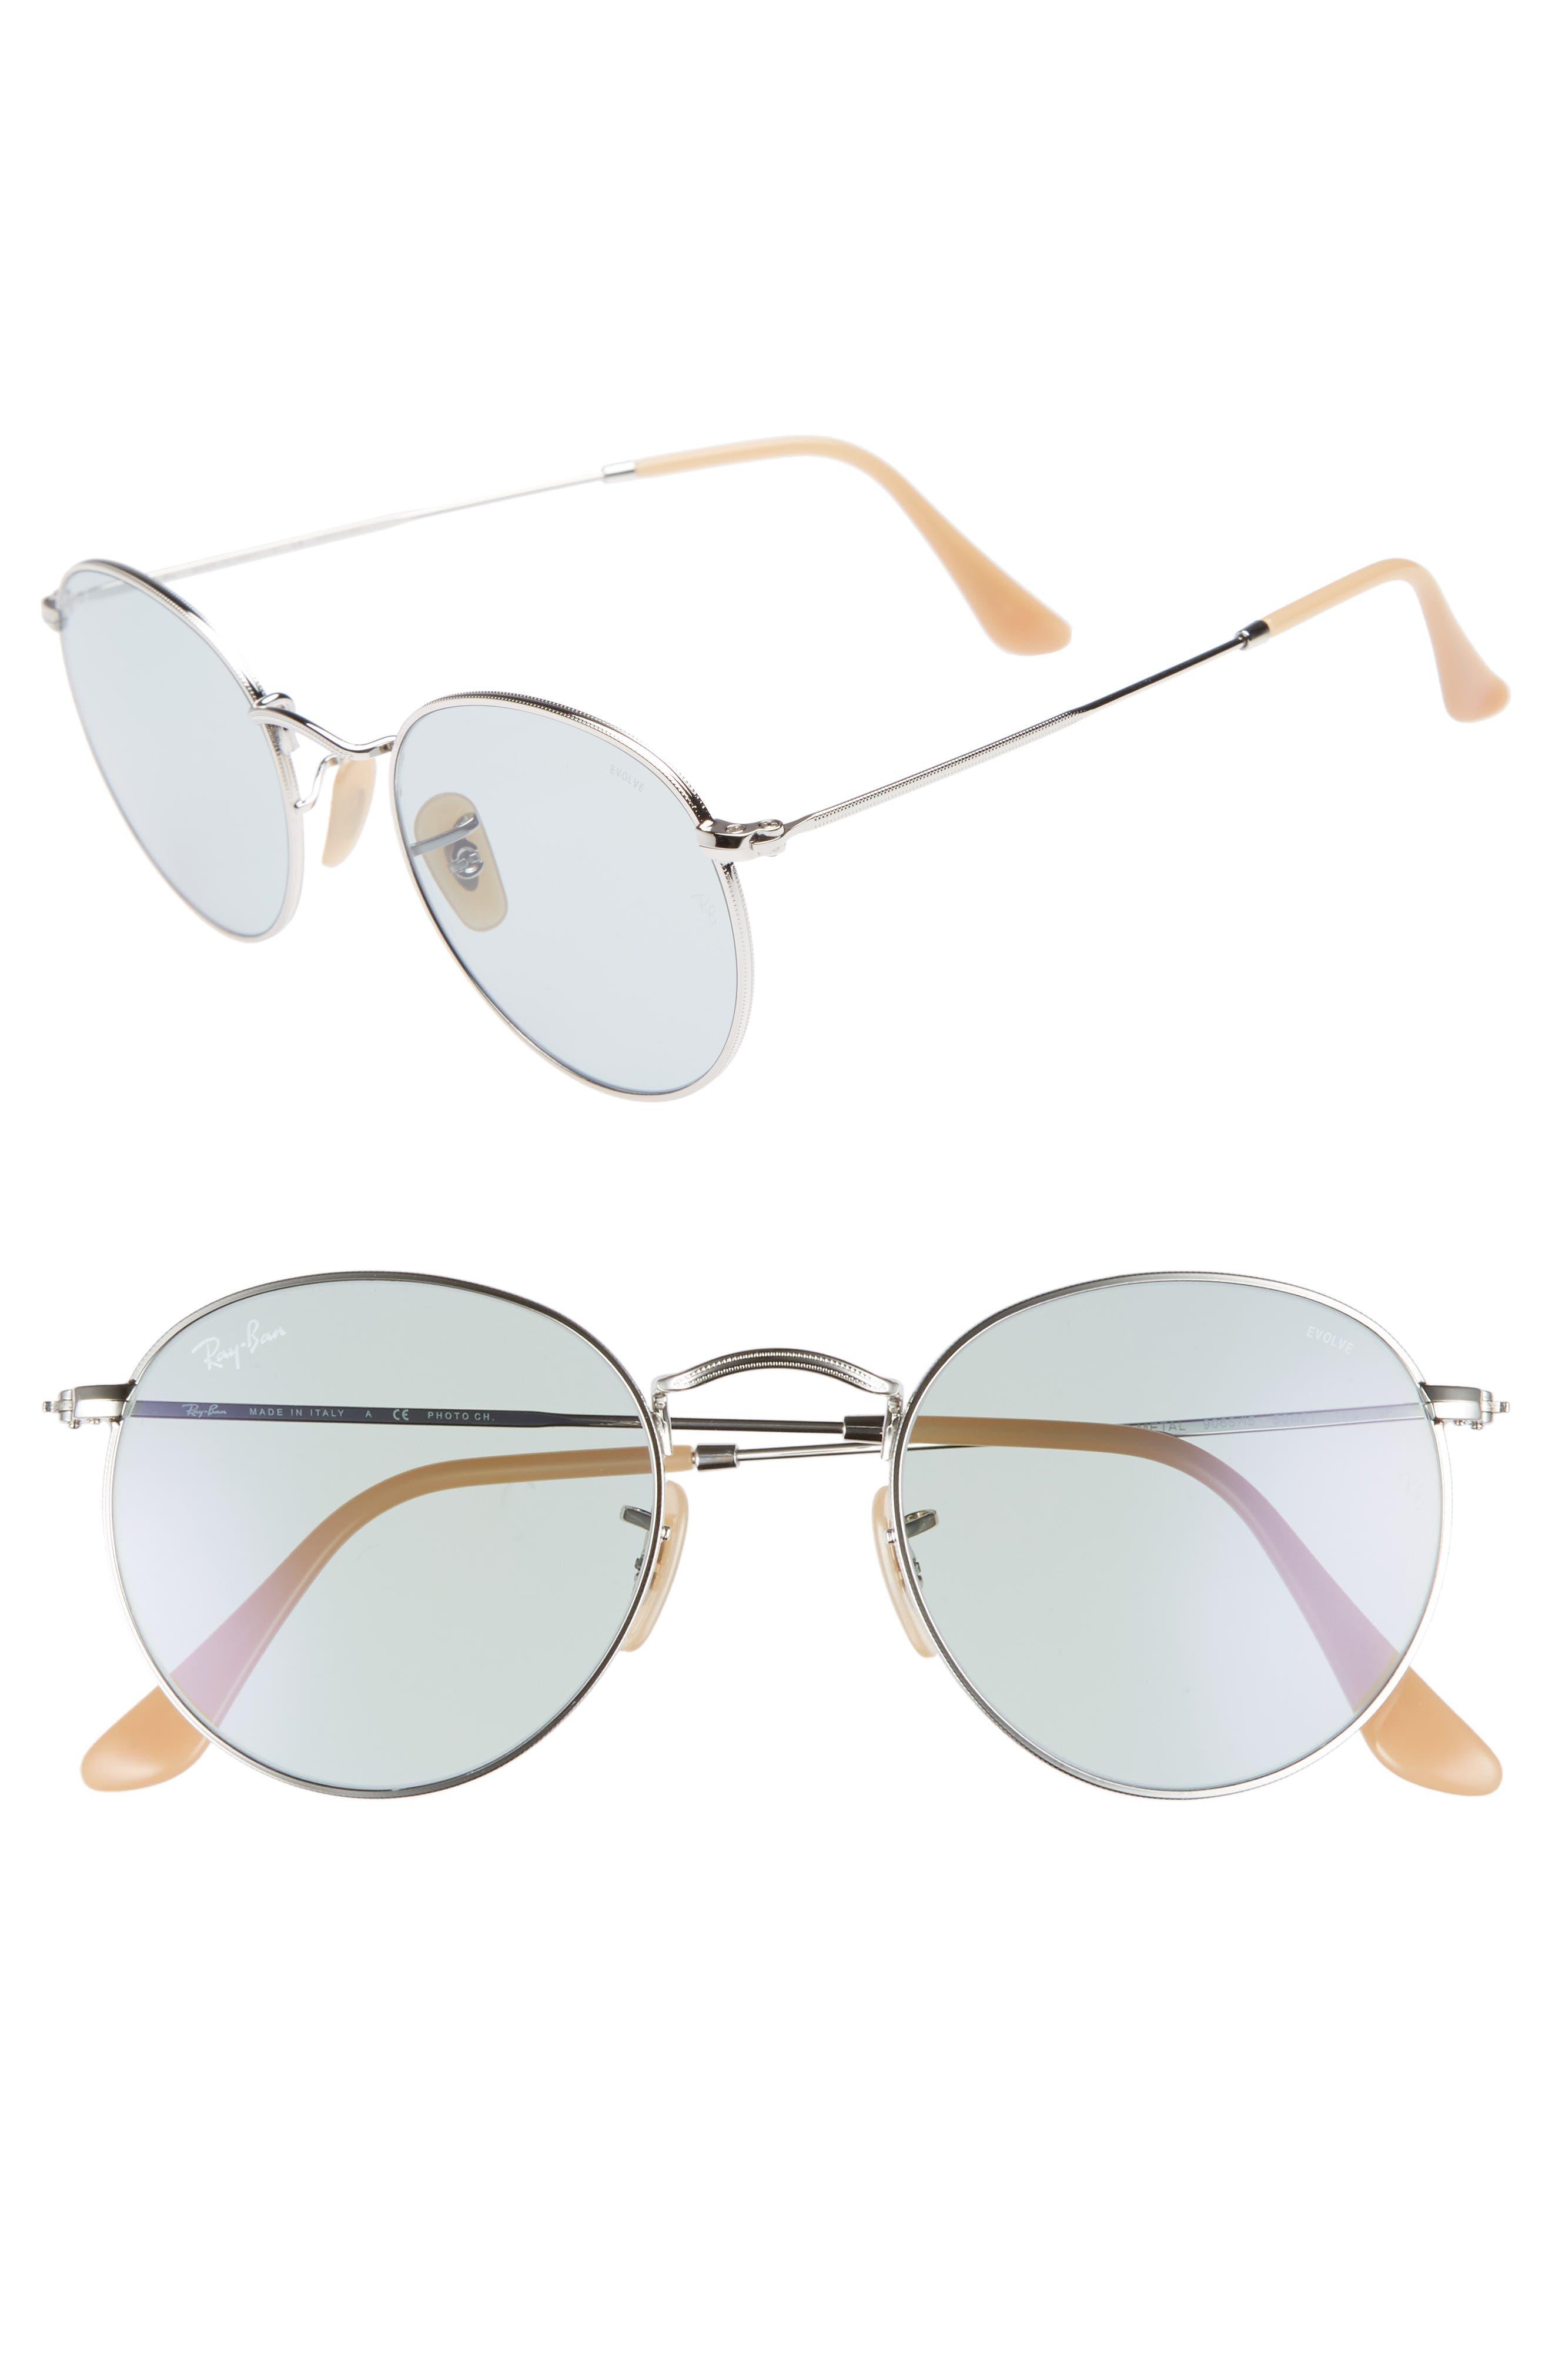 Evolve 50mm Polarized Round Sunglasses,                         Main,                         color, SILVER/ BLUE